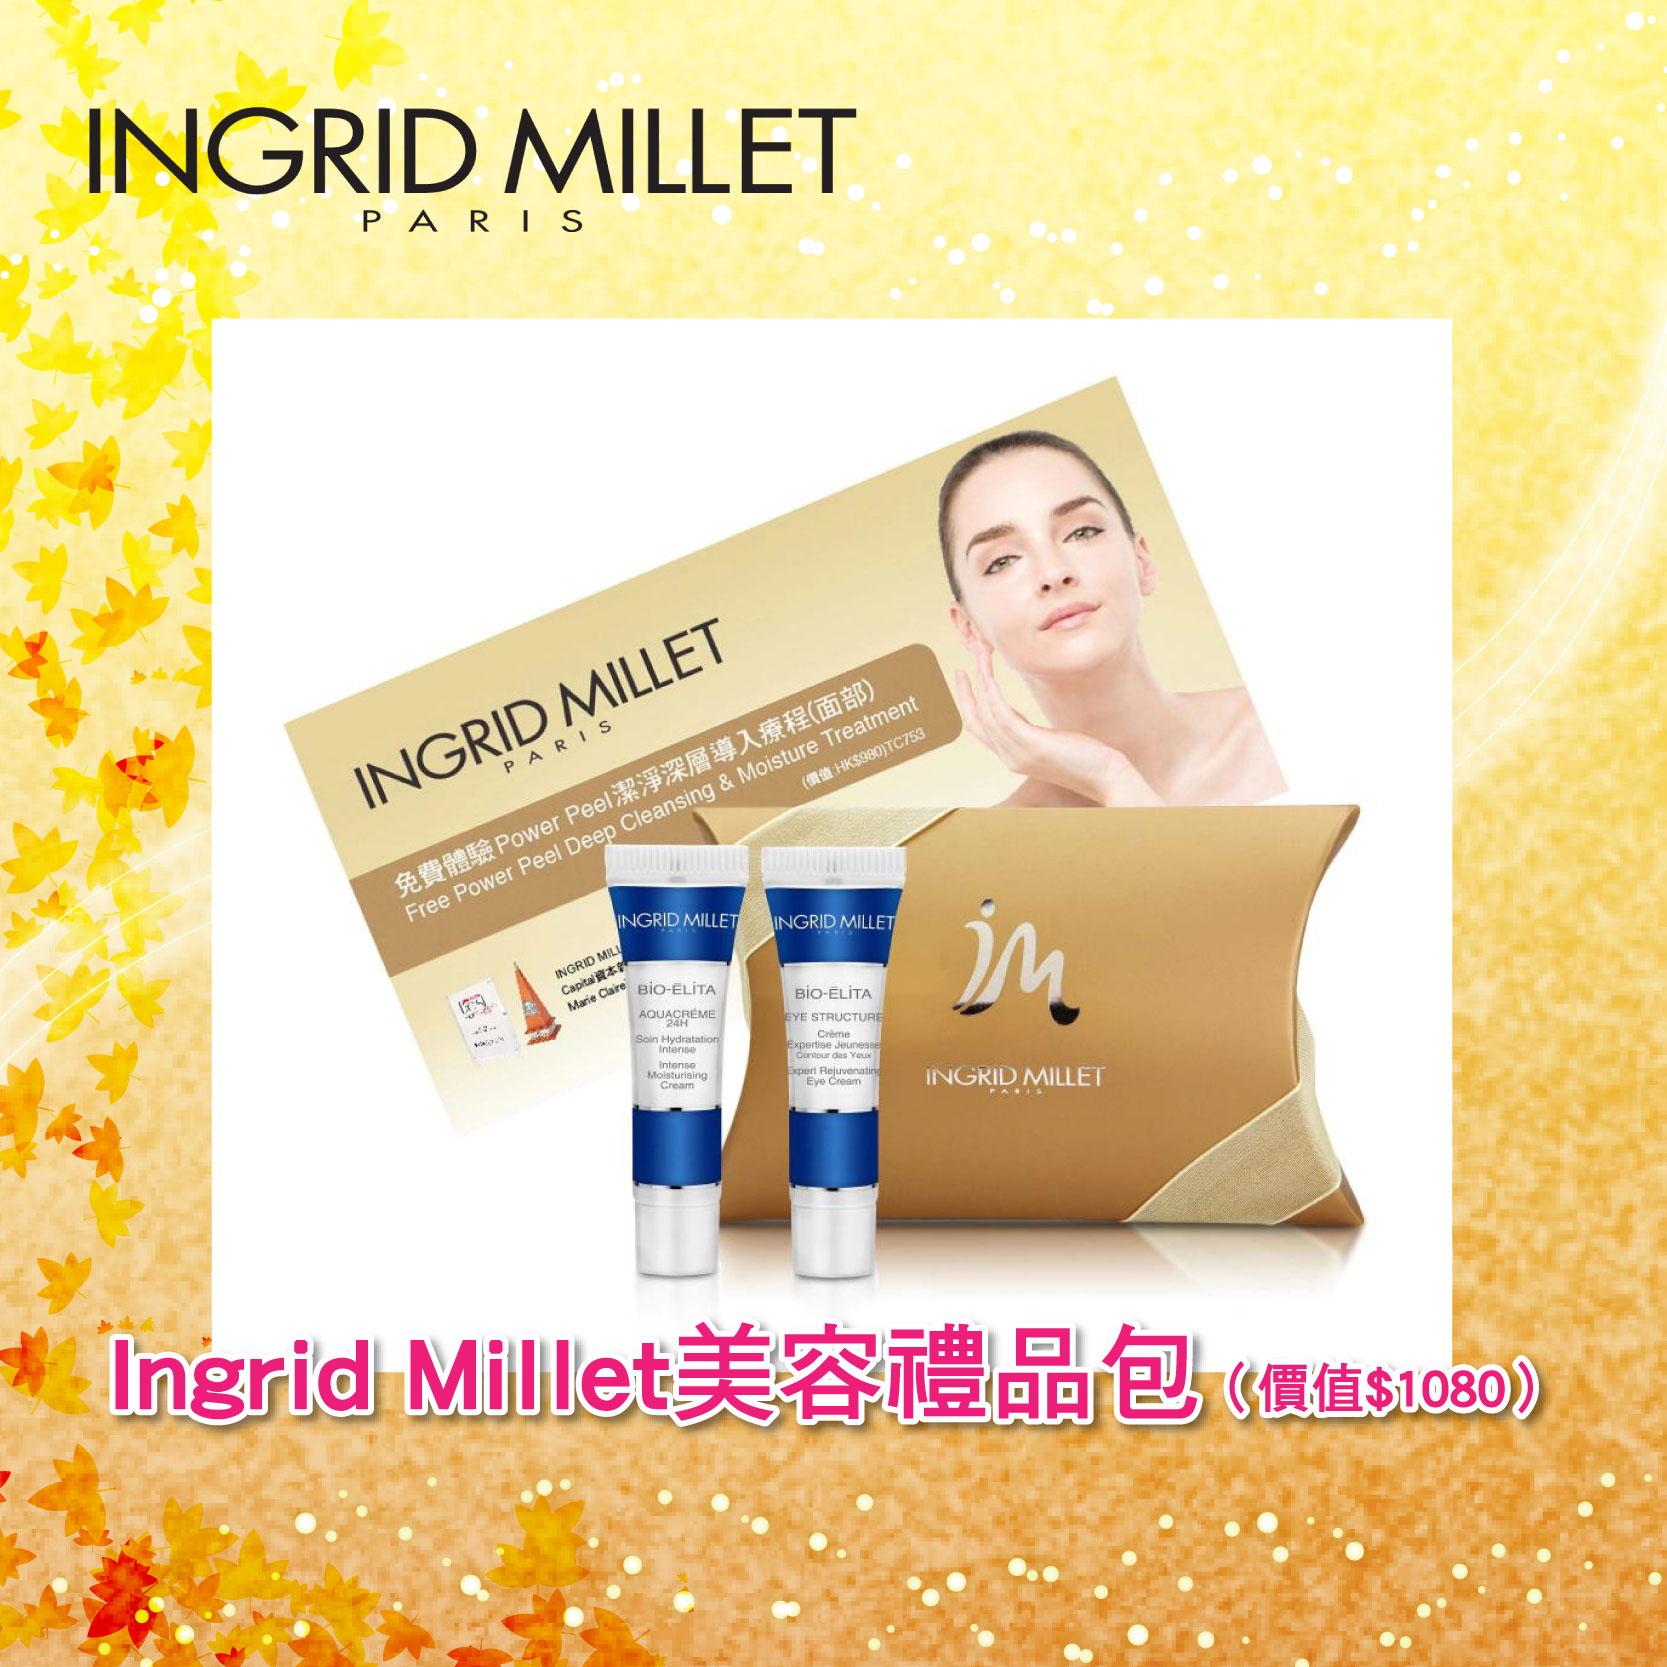 BP x Ingrid Millet 800x800_Ingrid Millet美容禮品包_工作區域 1.jpg